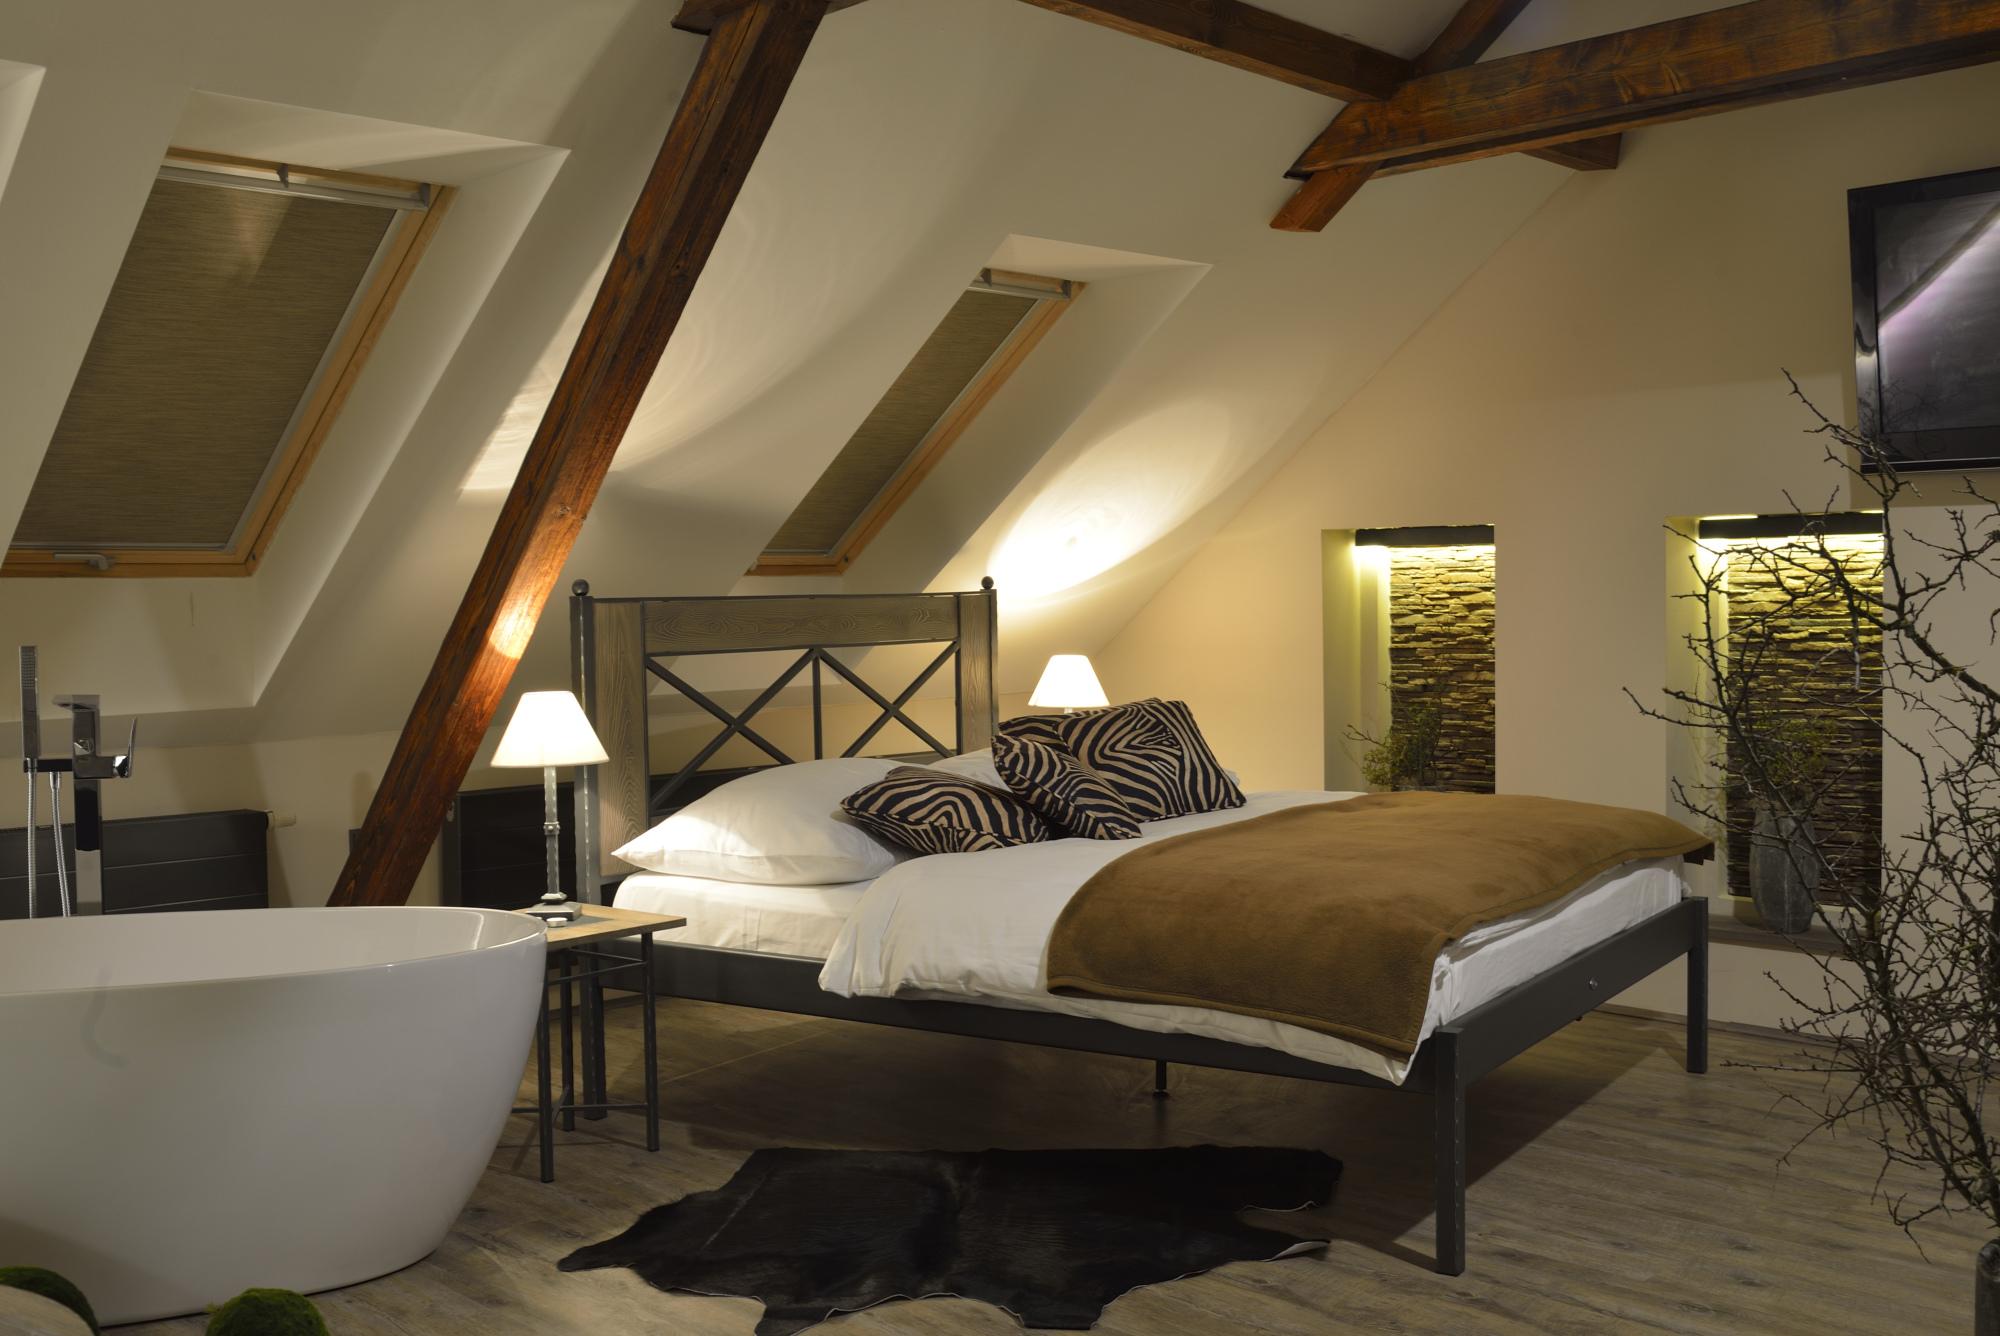 Apartmán Chamonix, hotel Via Ironia Vysoké Mýto